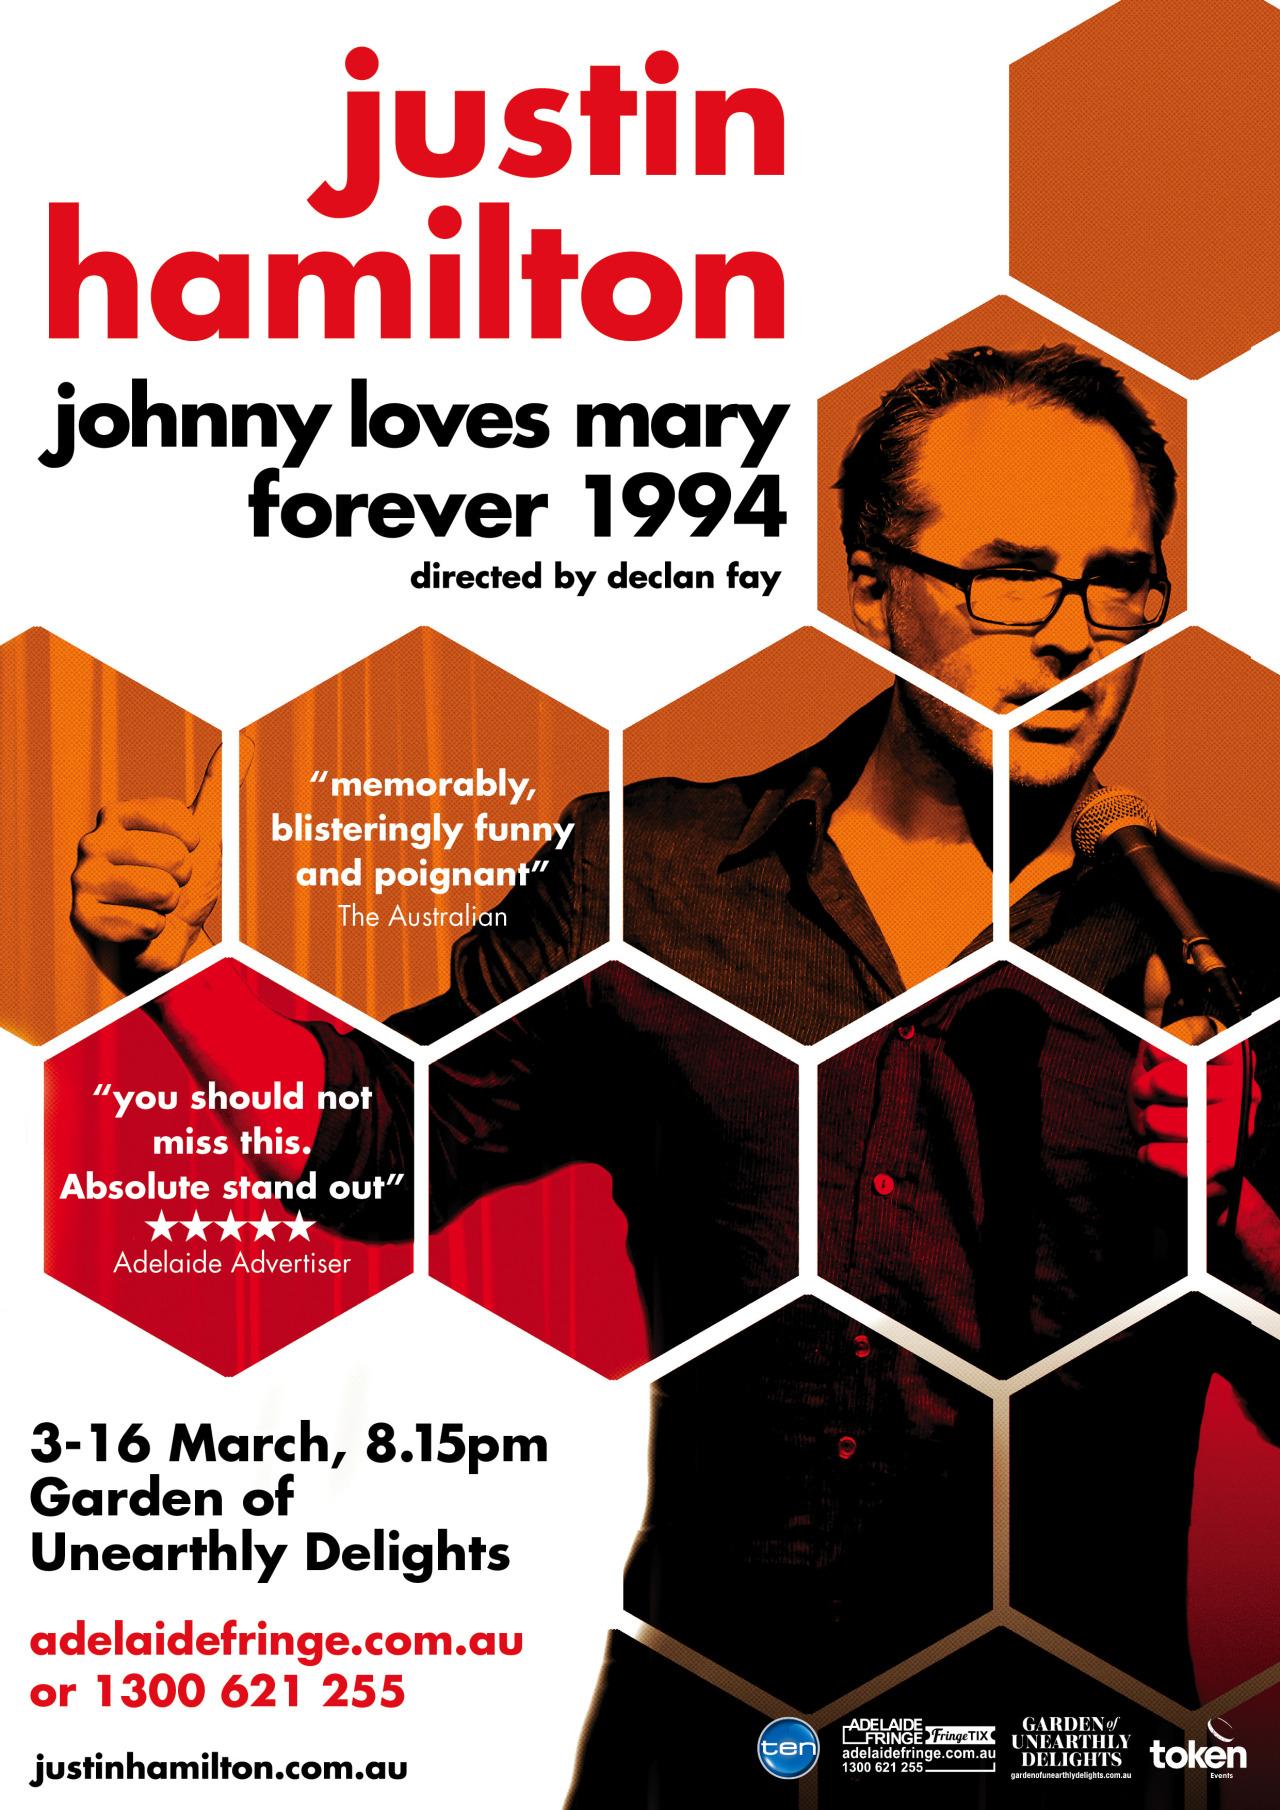 Poster I designed for @justinhamilton_'s new Adelaide Fringe and MIC show. Go see it.